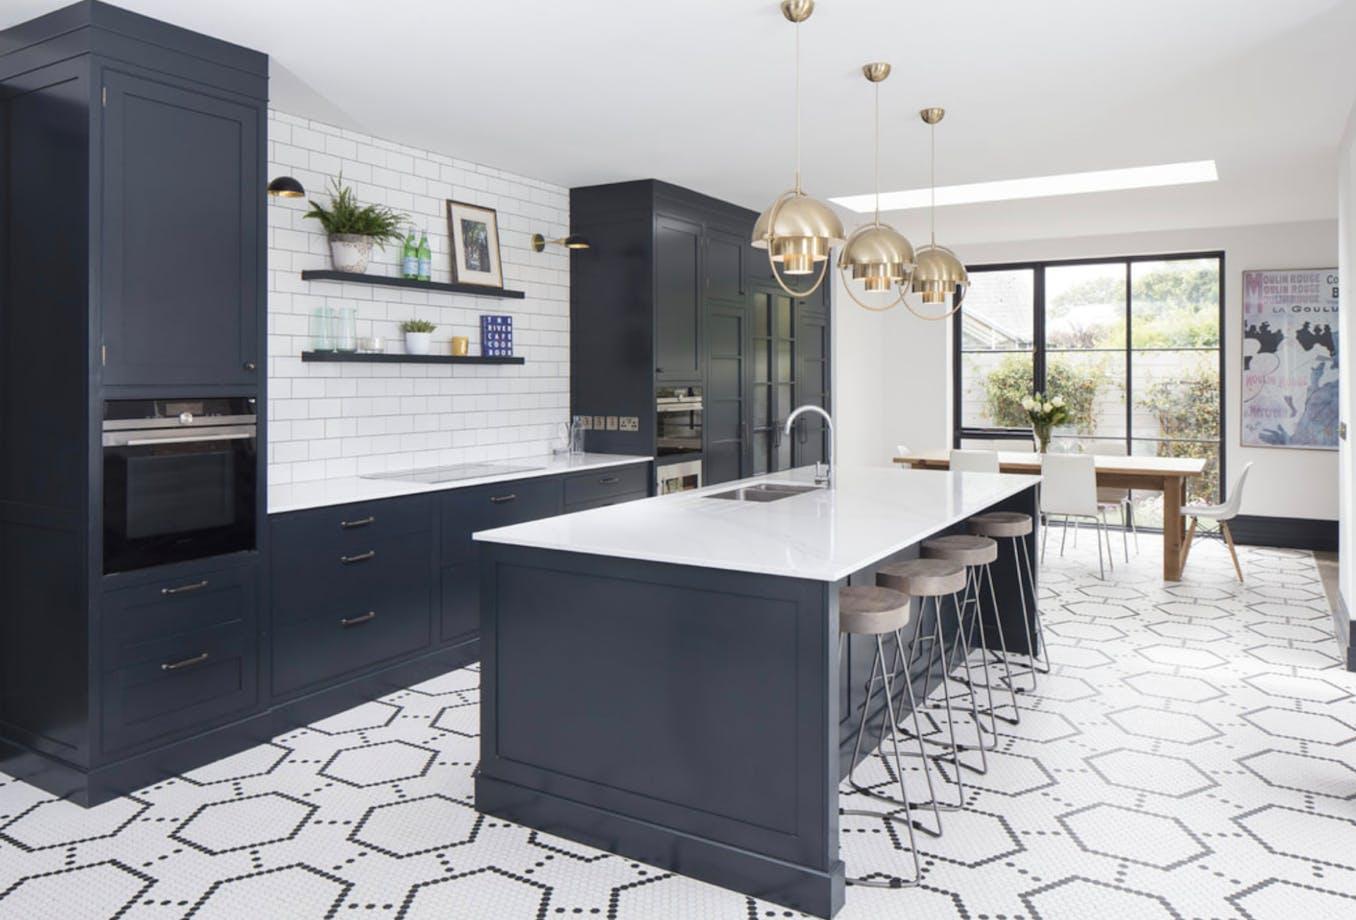 Rhatigan & Hick Residential Kitchen